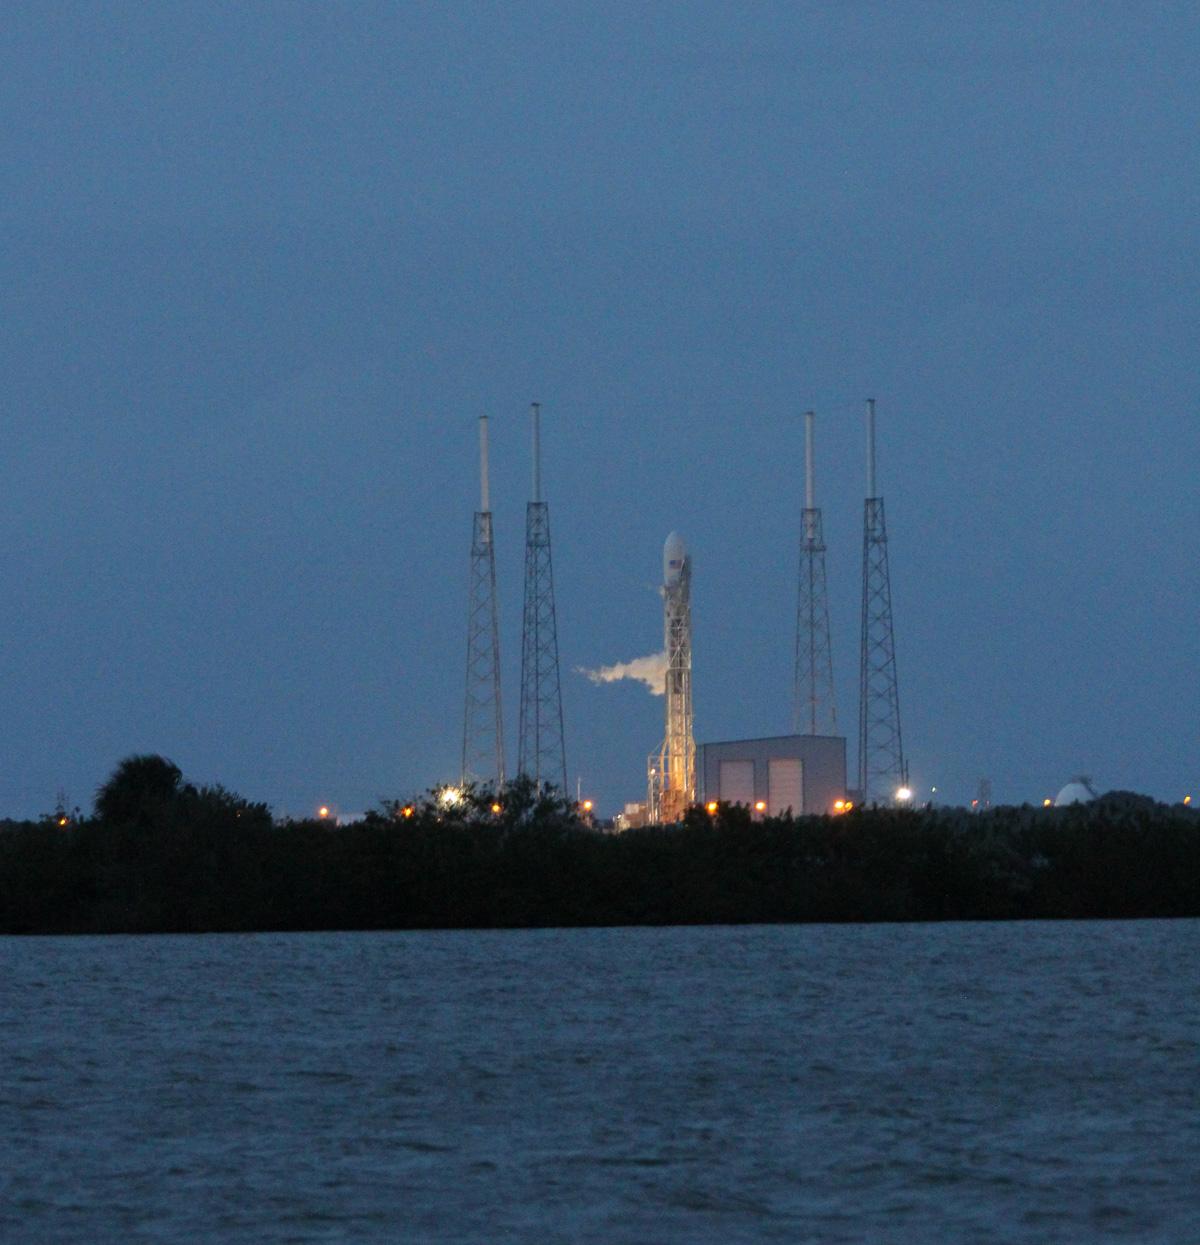 spacex cape canaveral fl - photo #37